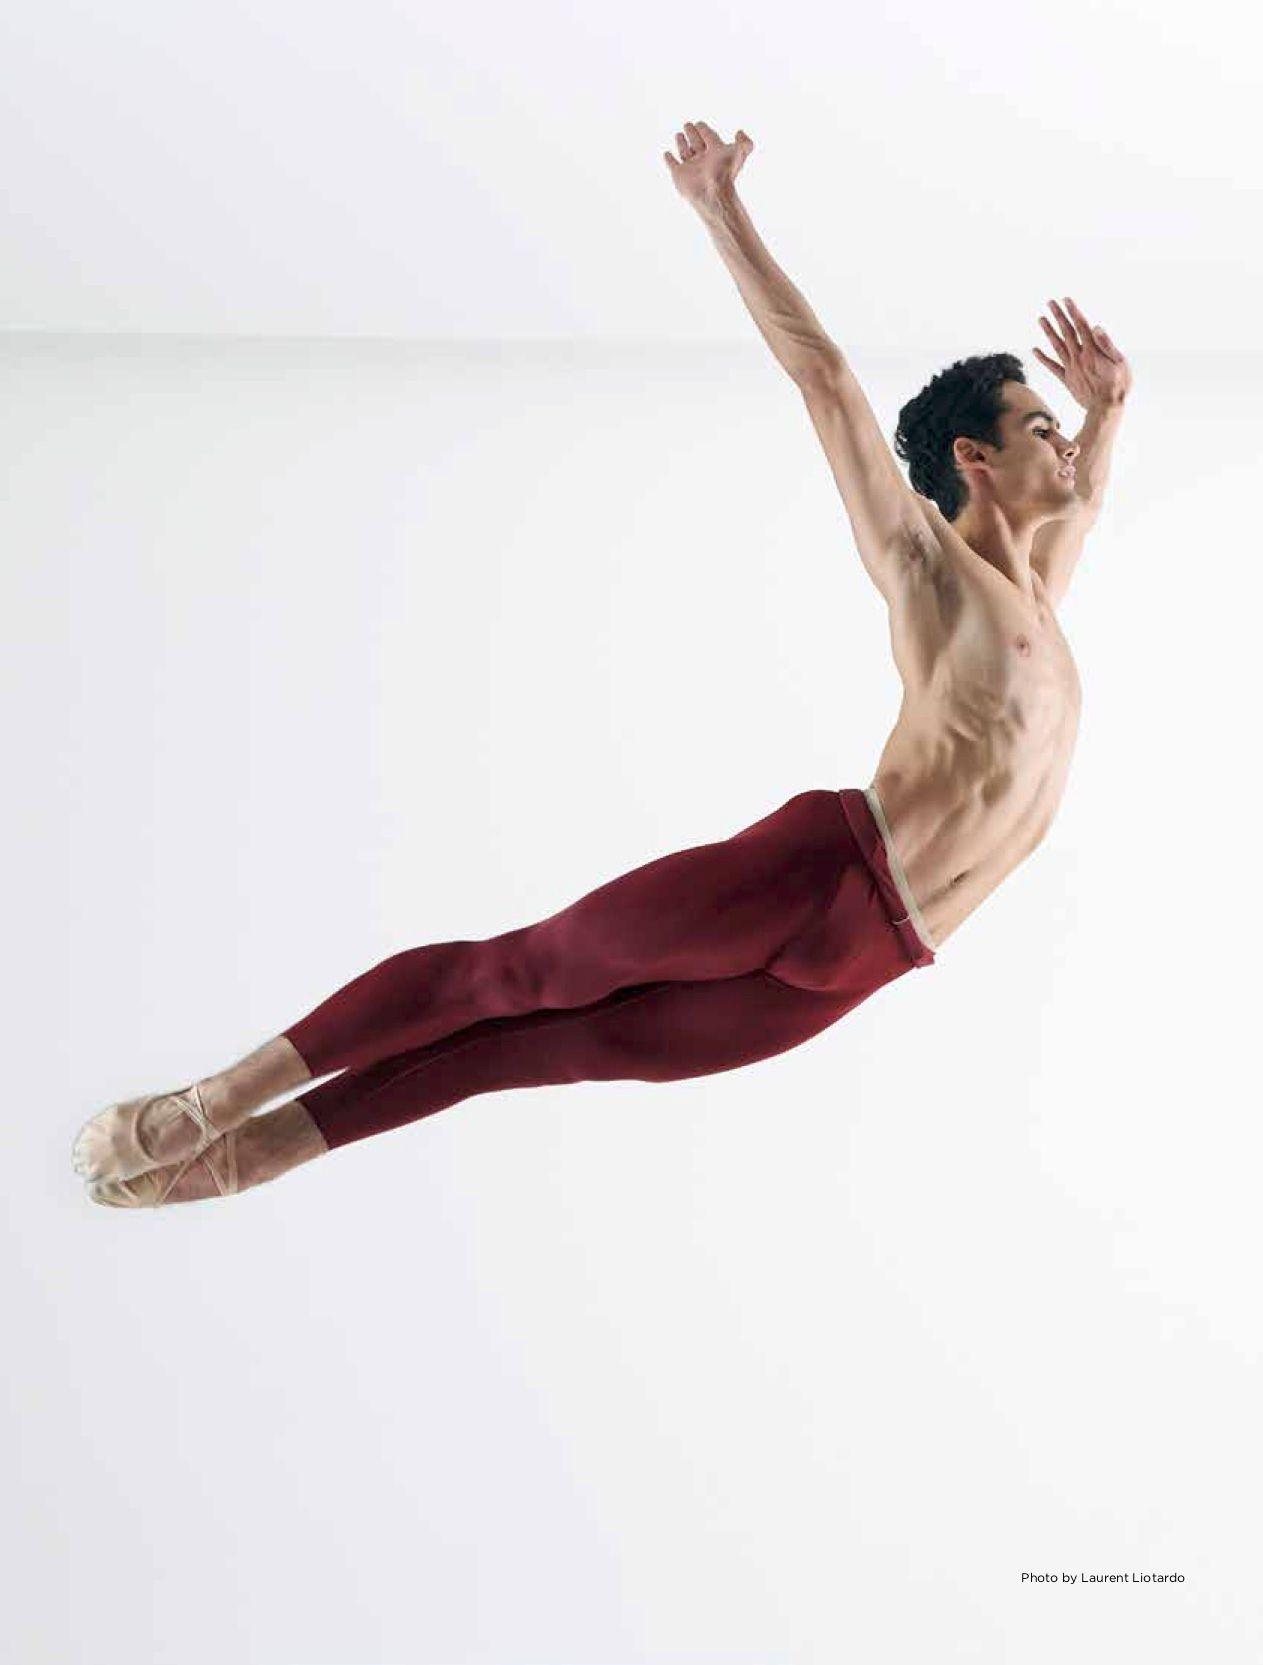 The Wonderful World of Dance Magazine Act III (PRINT) in